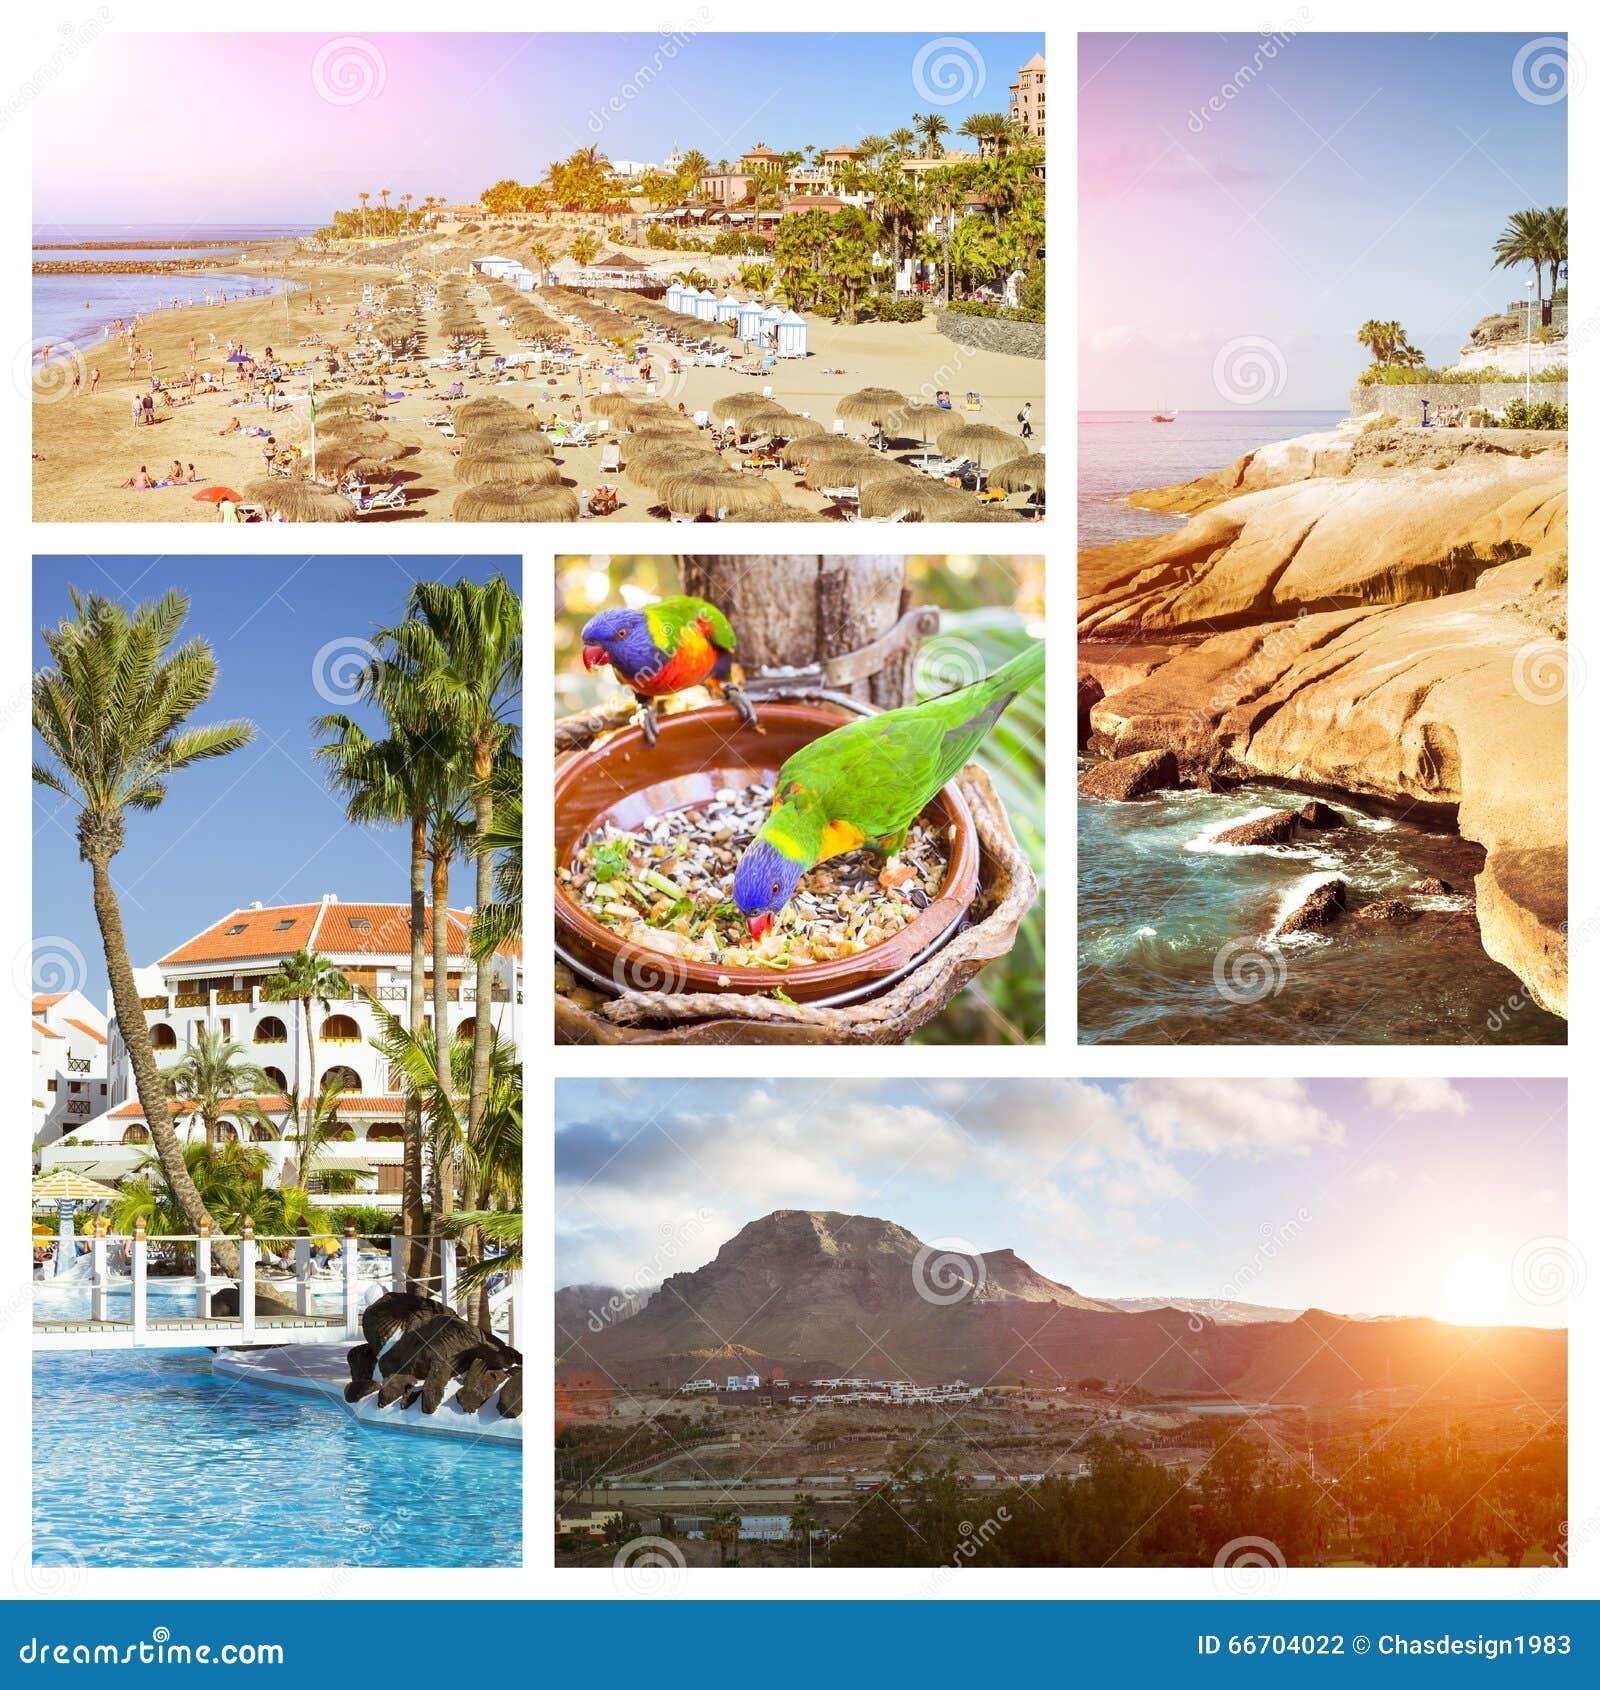 Tenerife Collage, Sunny Beach Travel Vacation Stock Photo